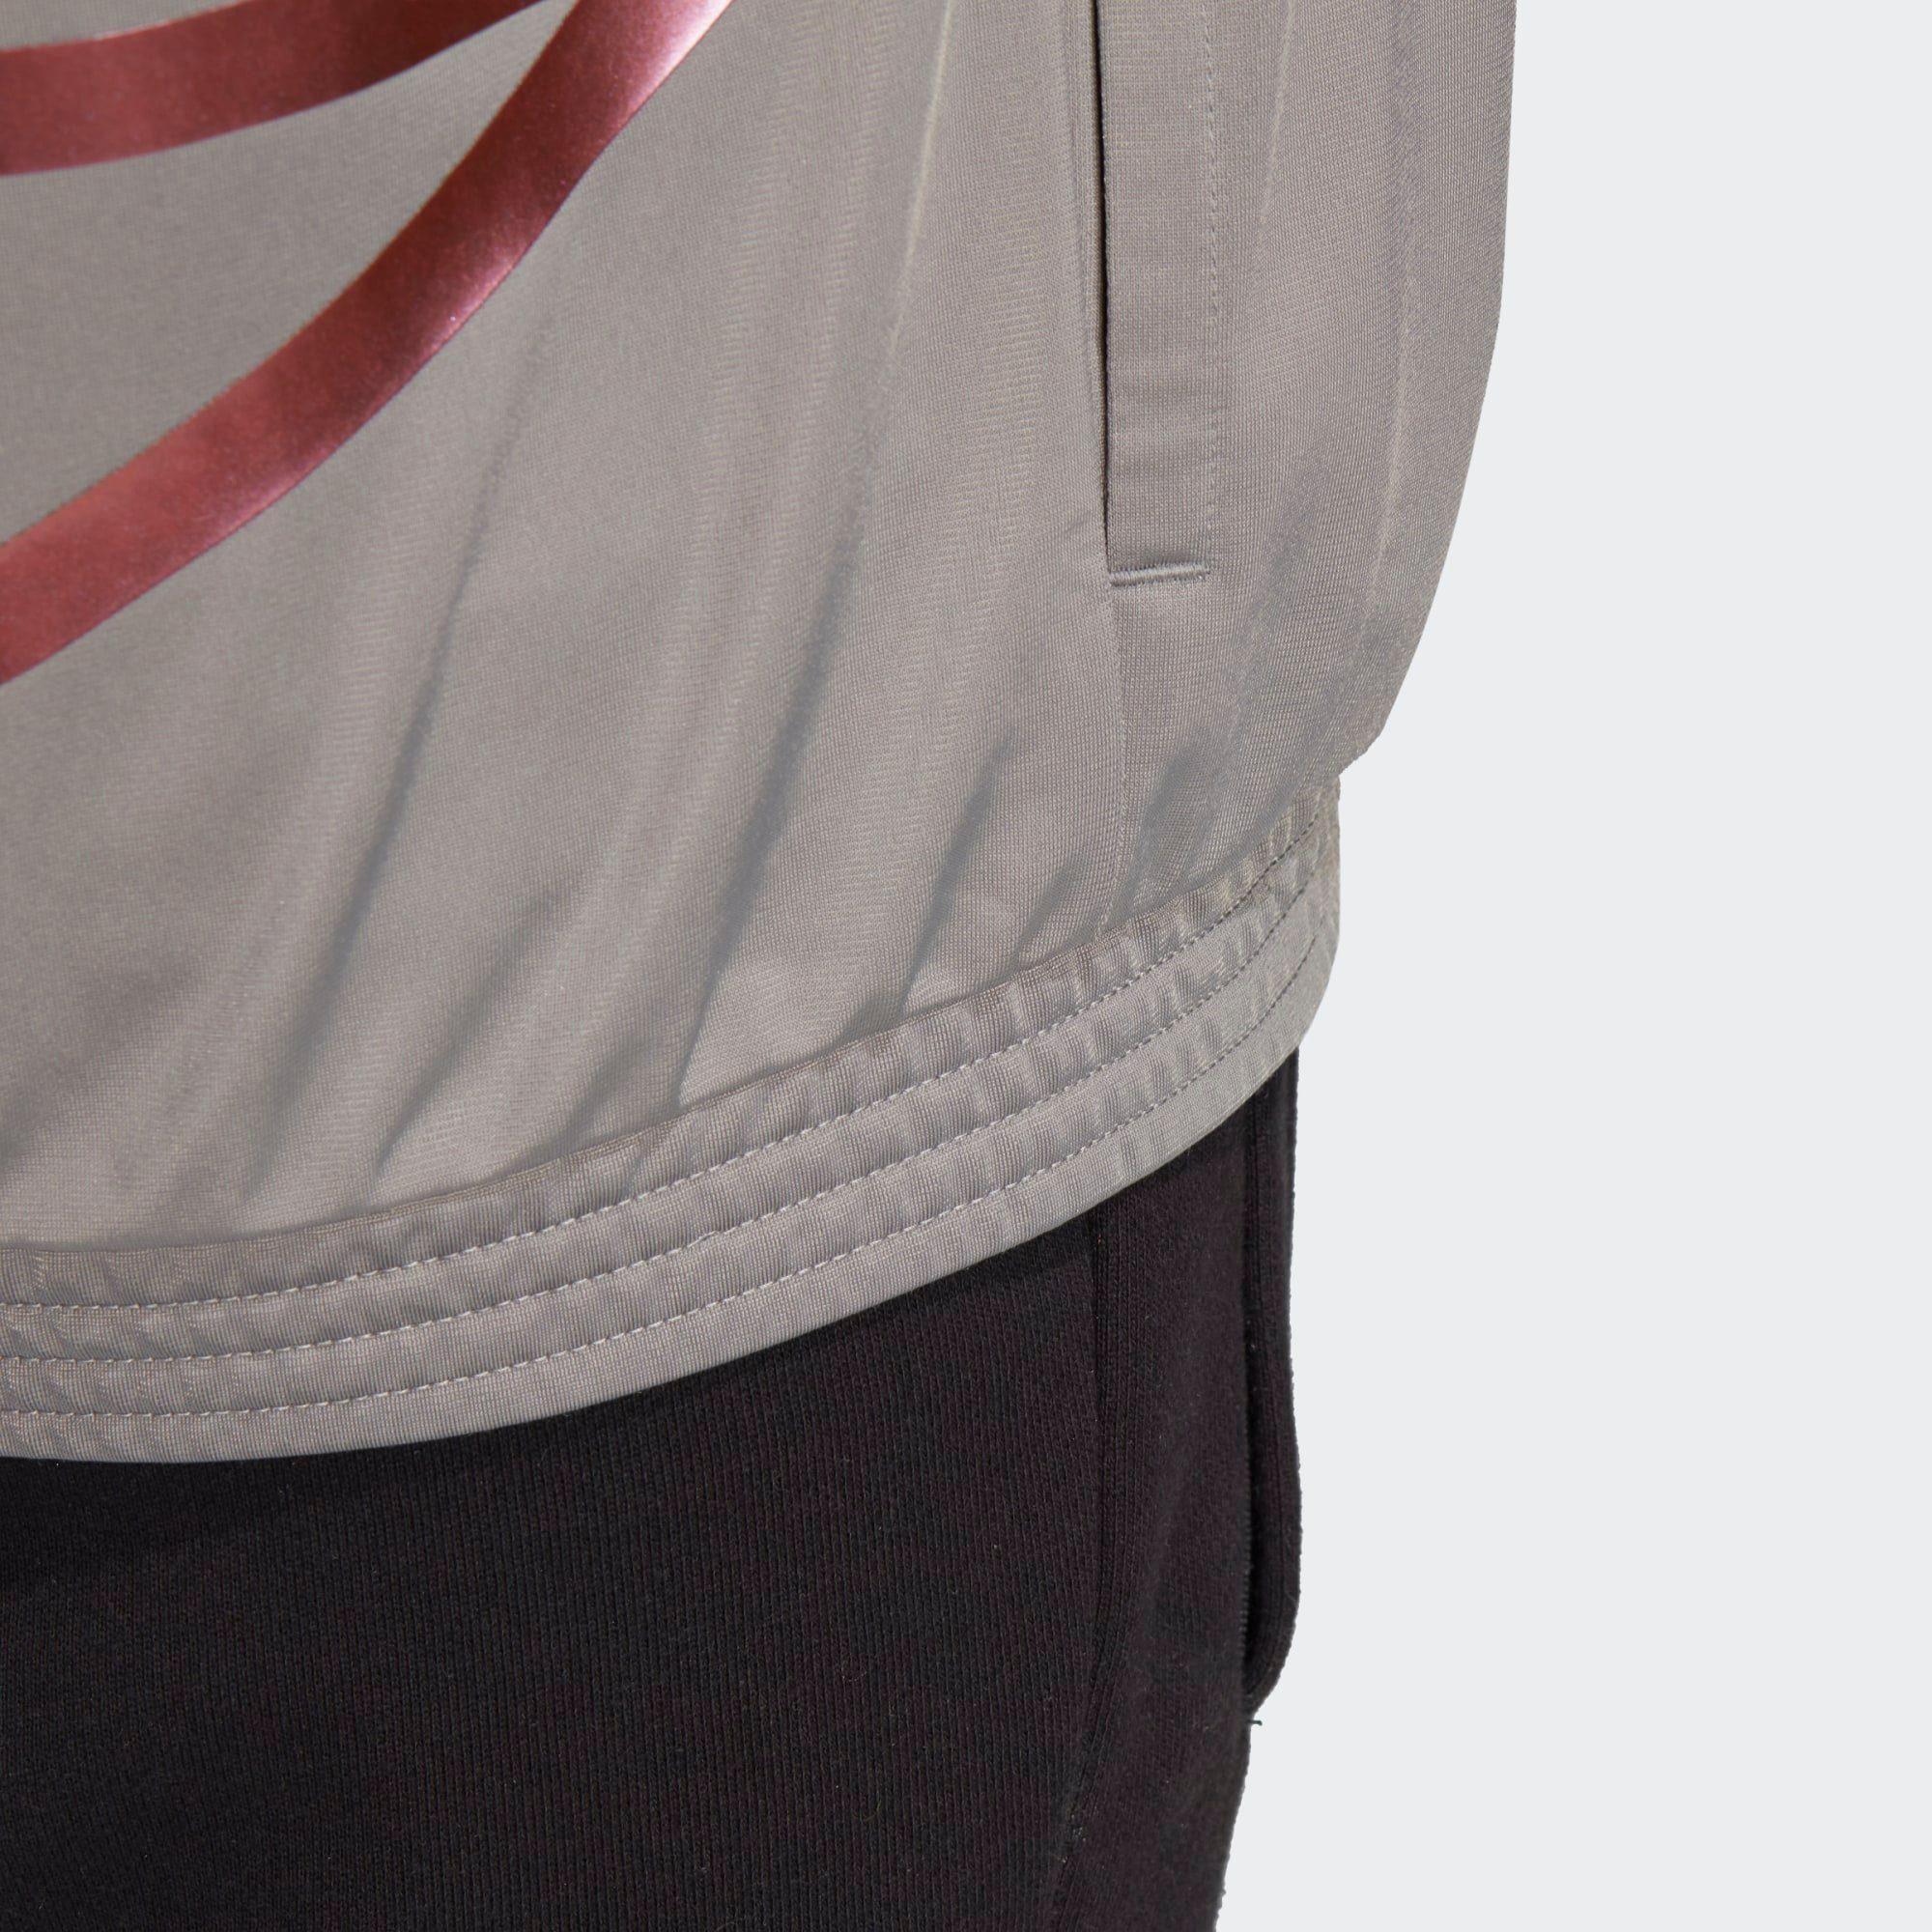 adidas Originals Sweatjacke Zeno Originals Jacke APOQZQ 4ZFvb1